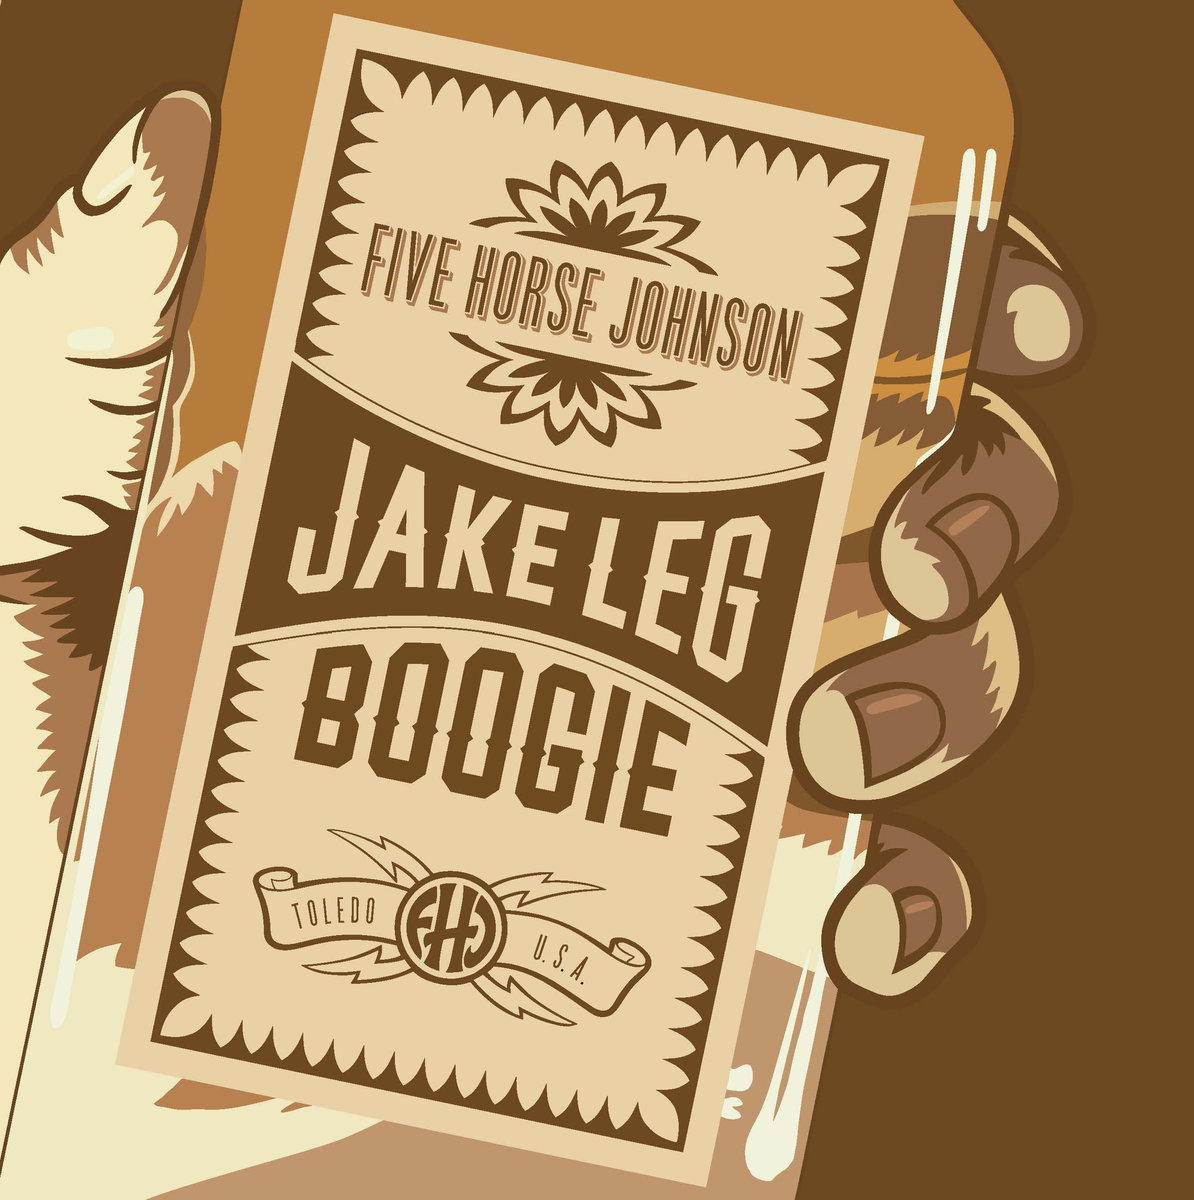 five horse johnson-jake leg boogie